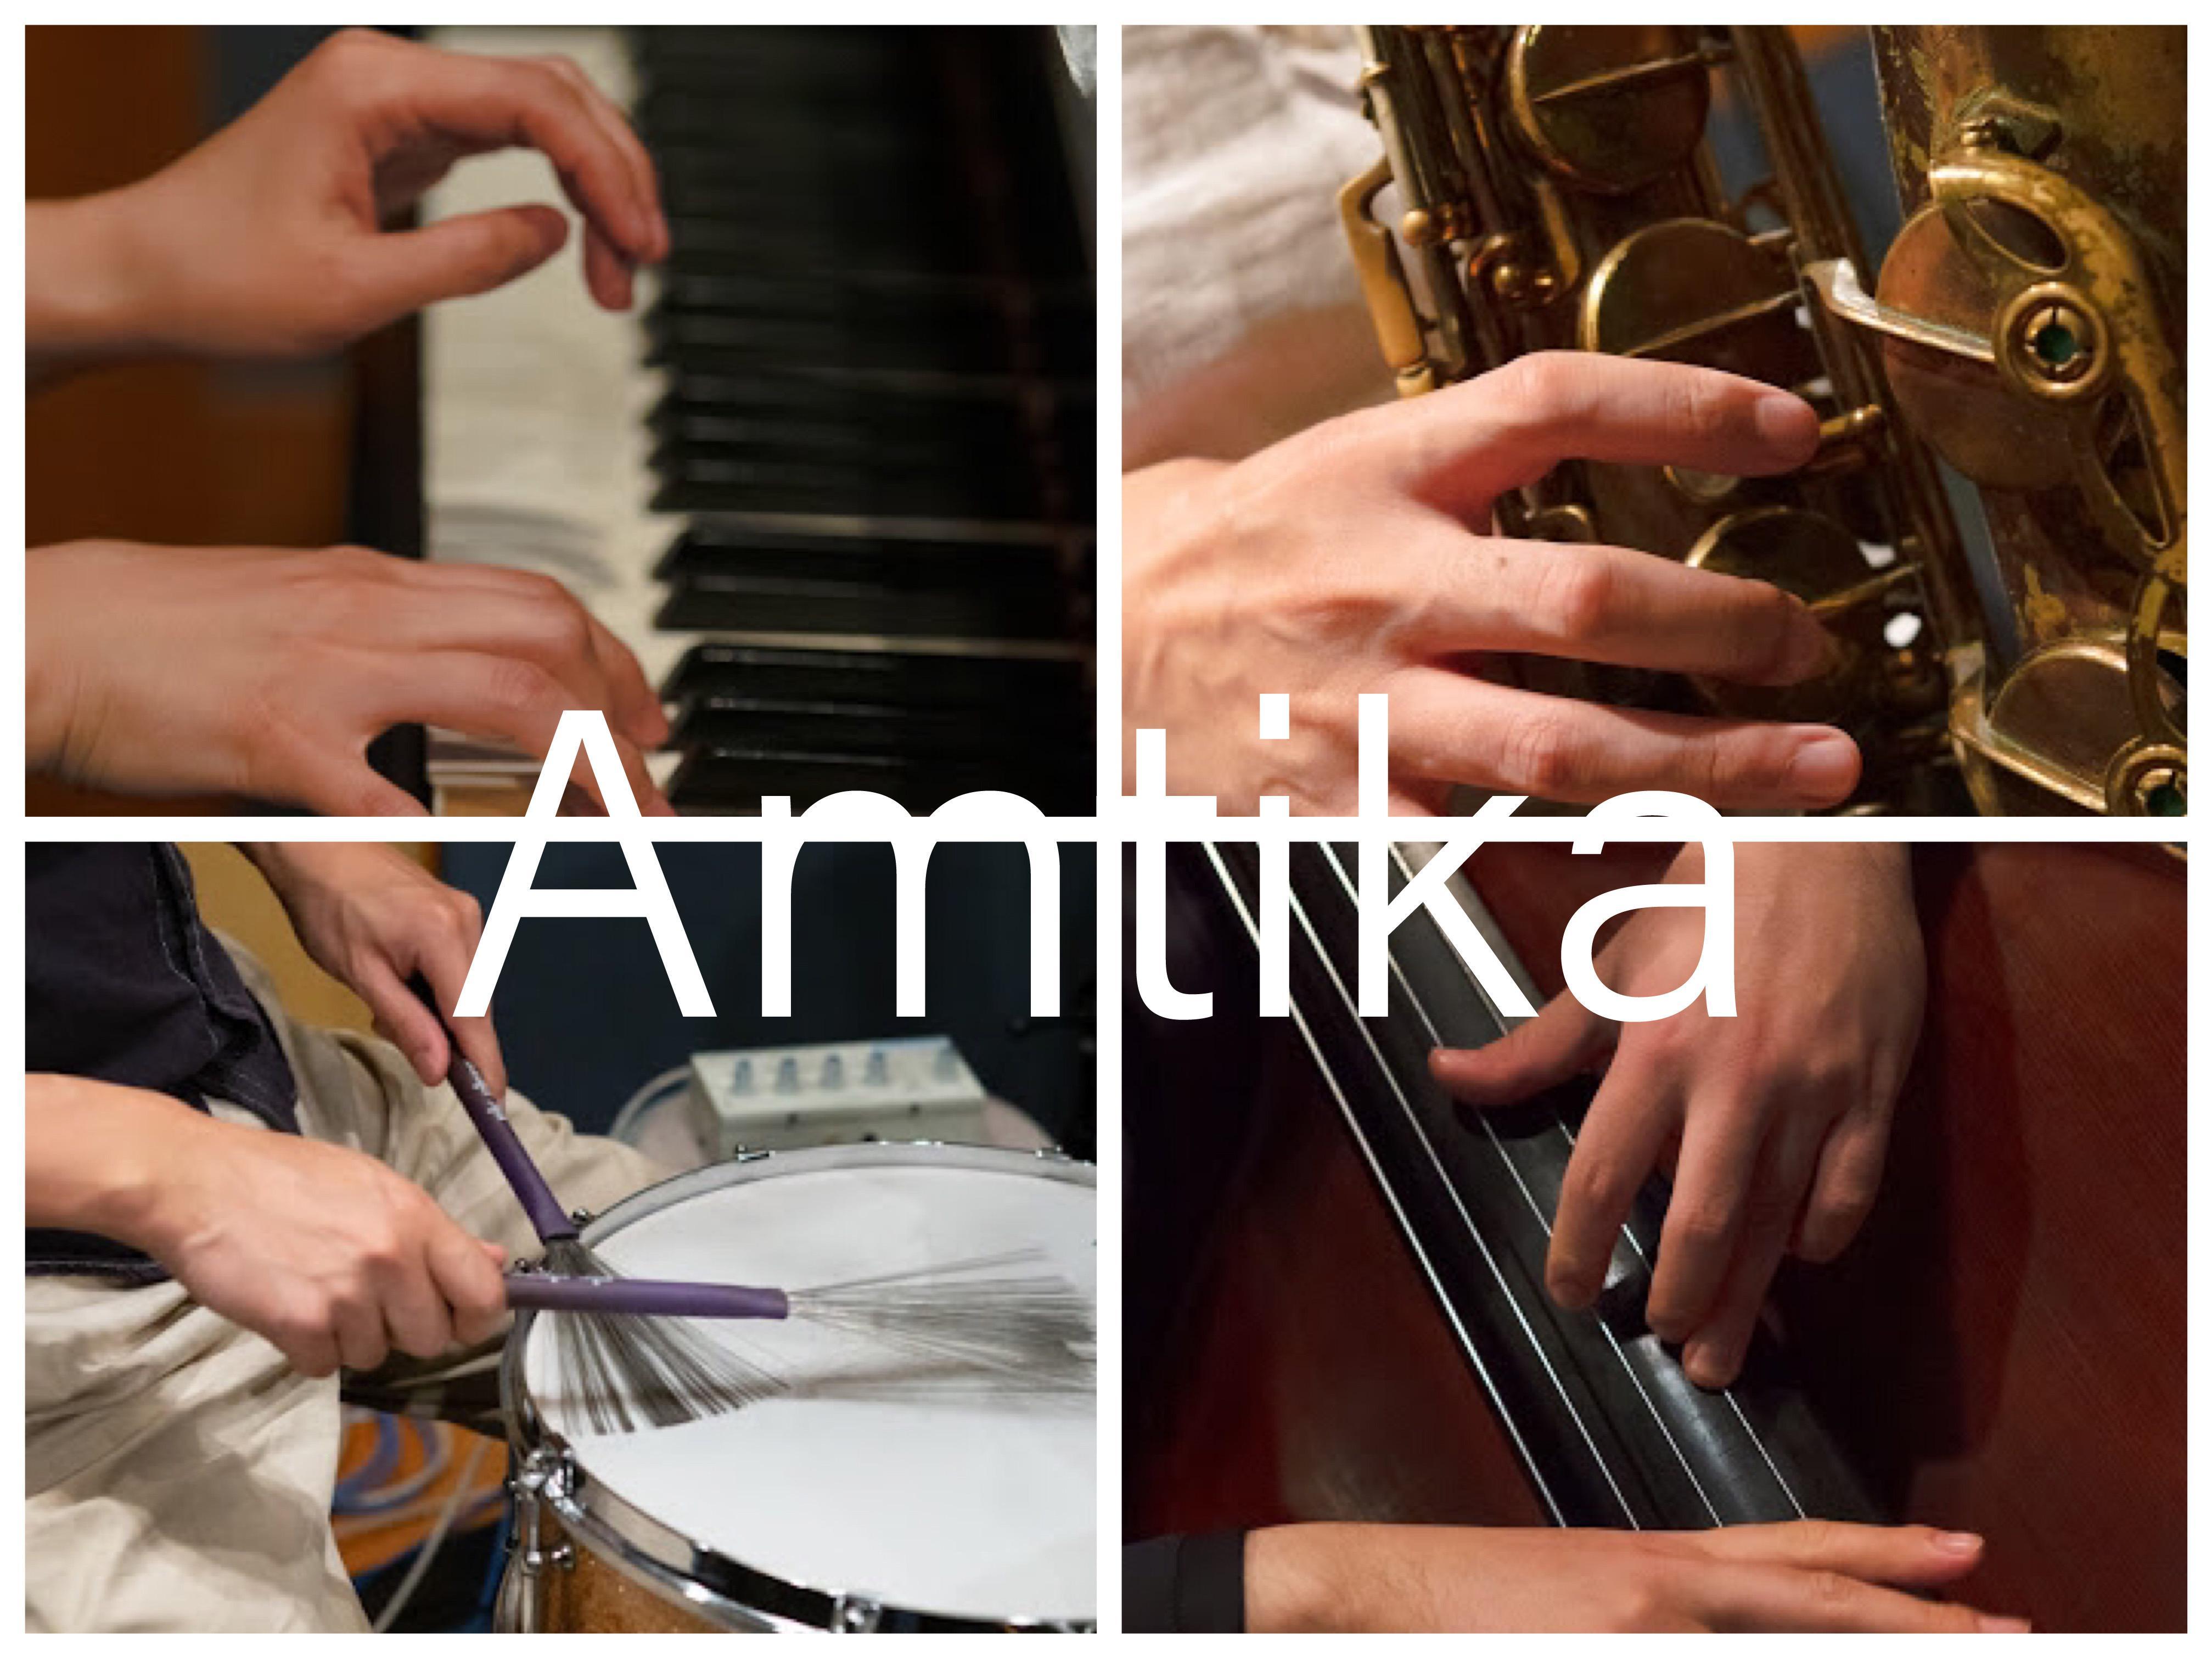 Amtika